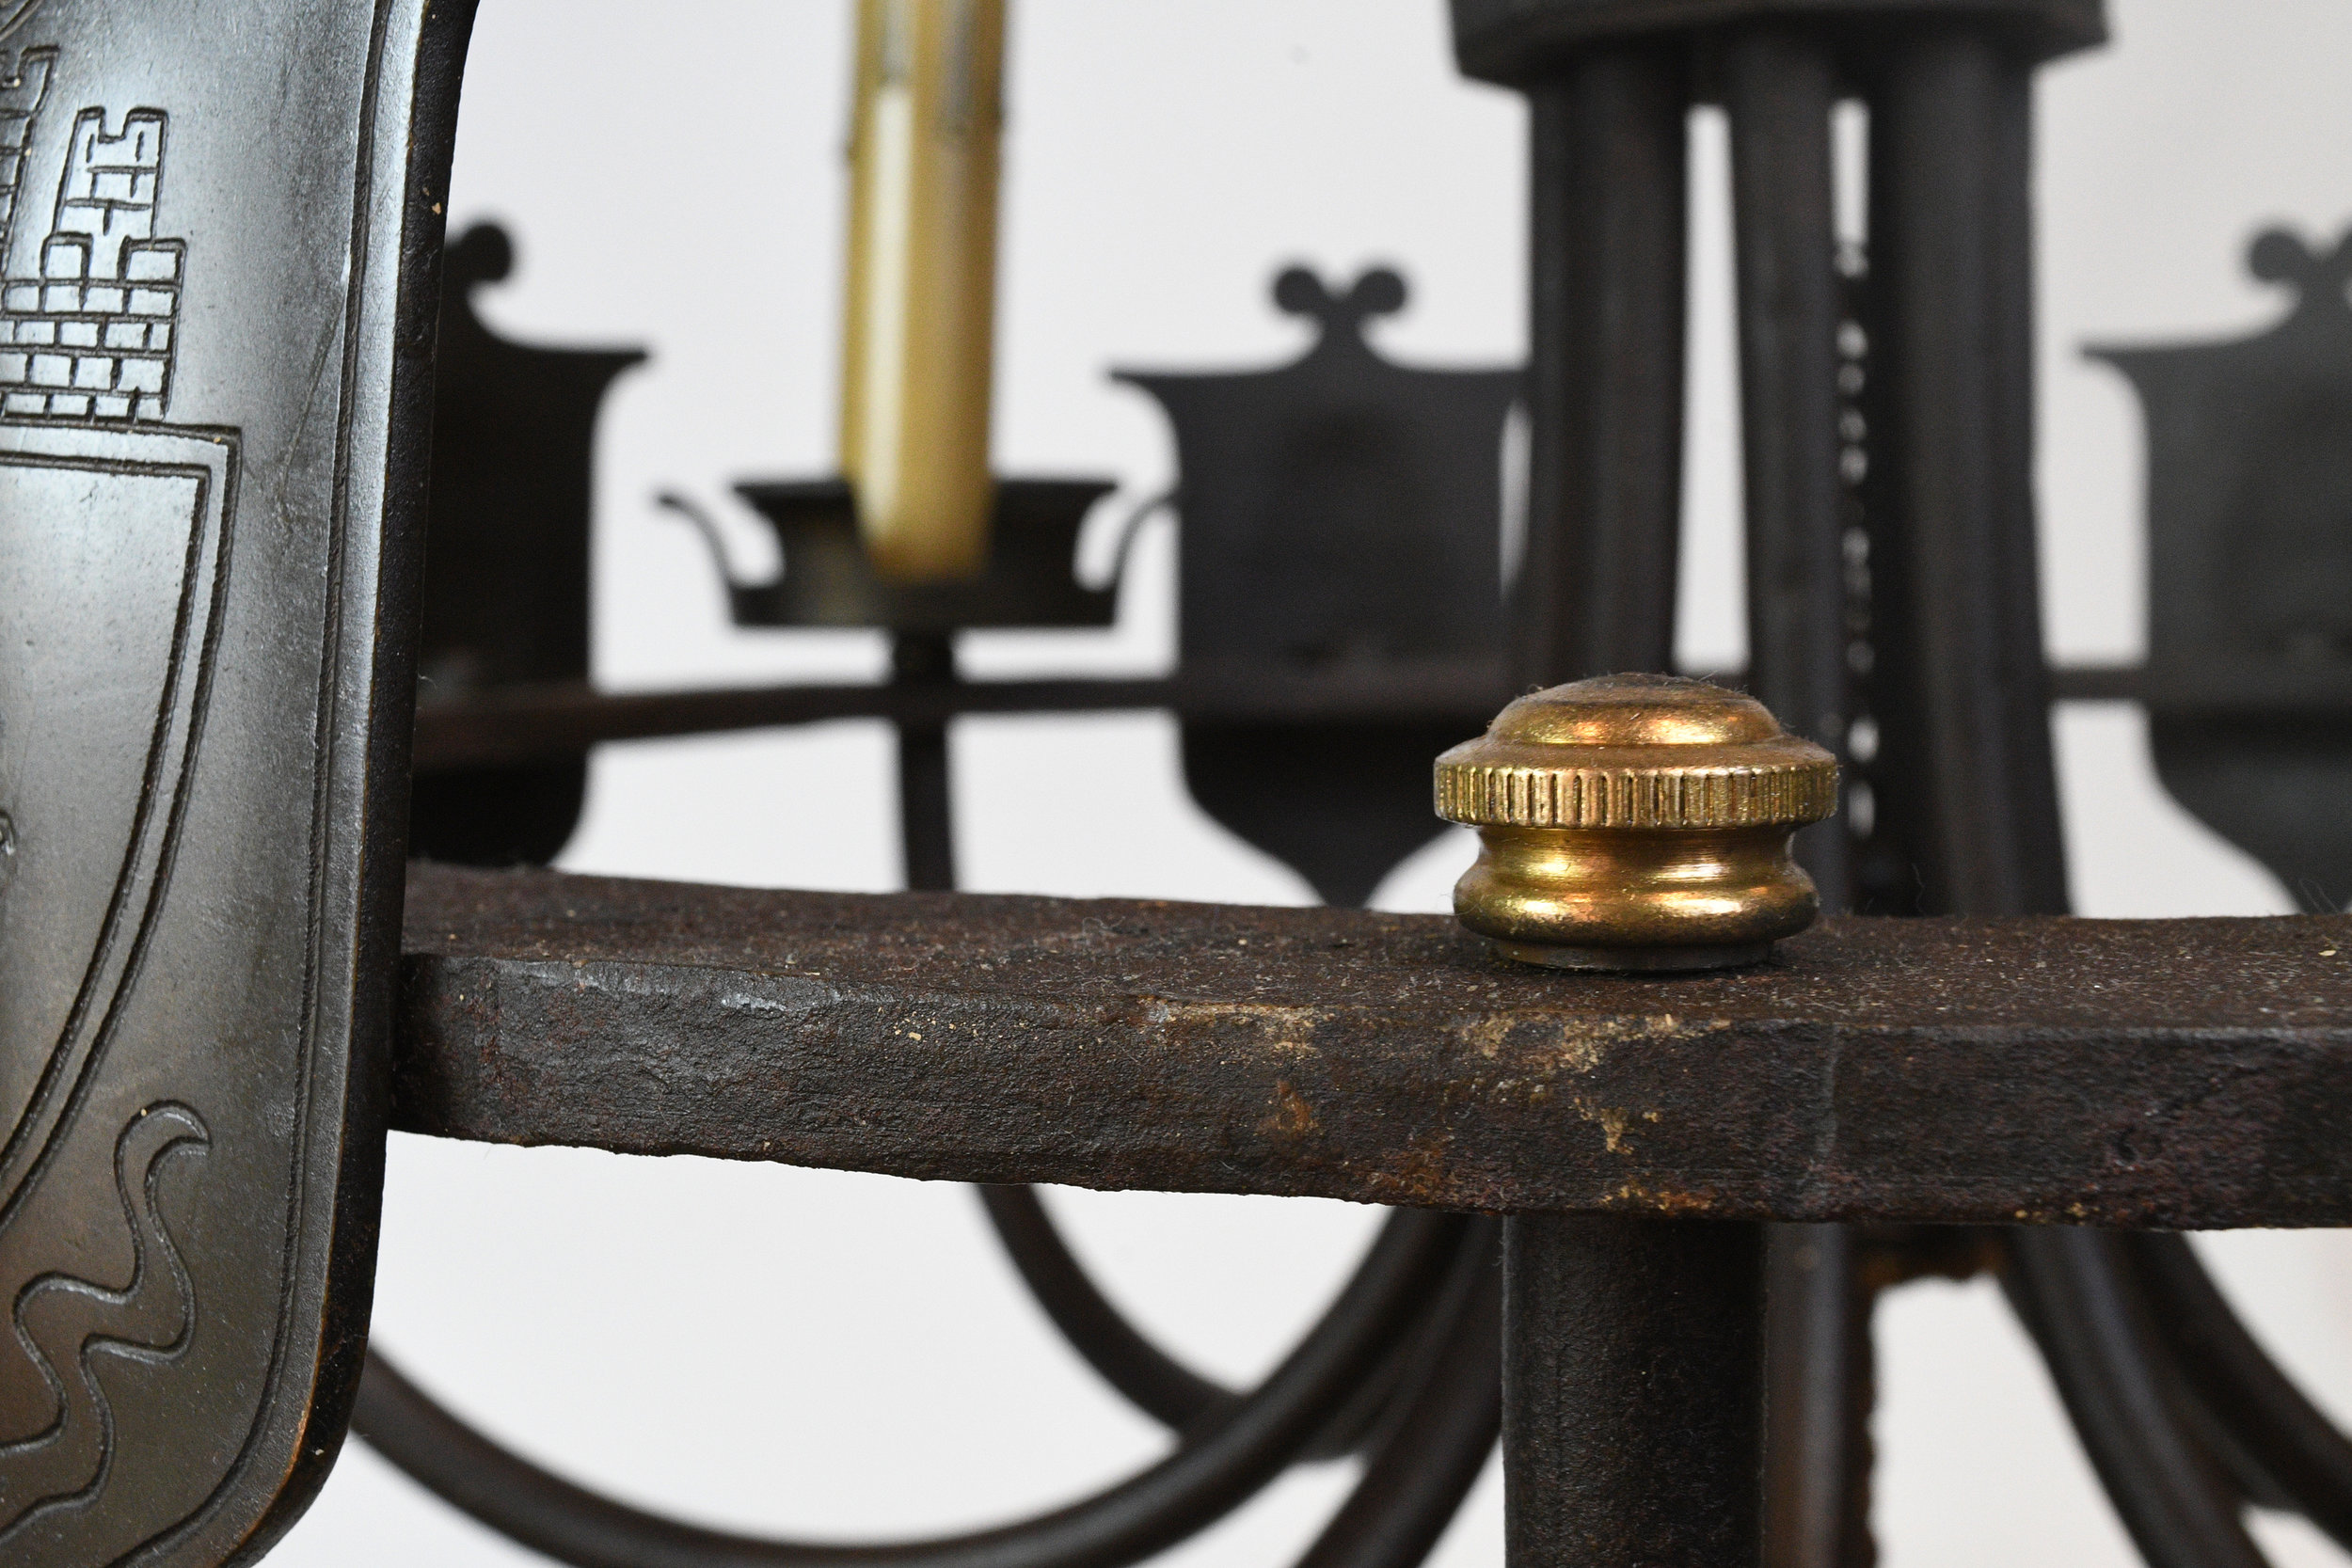 47538-iron-tudor-chand-with-hoop-shield-detail-2.jpg